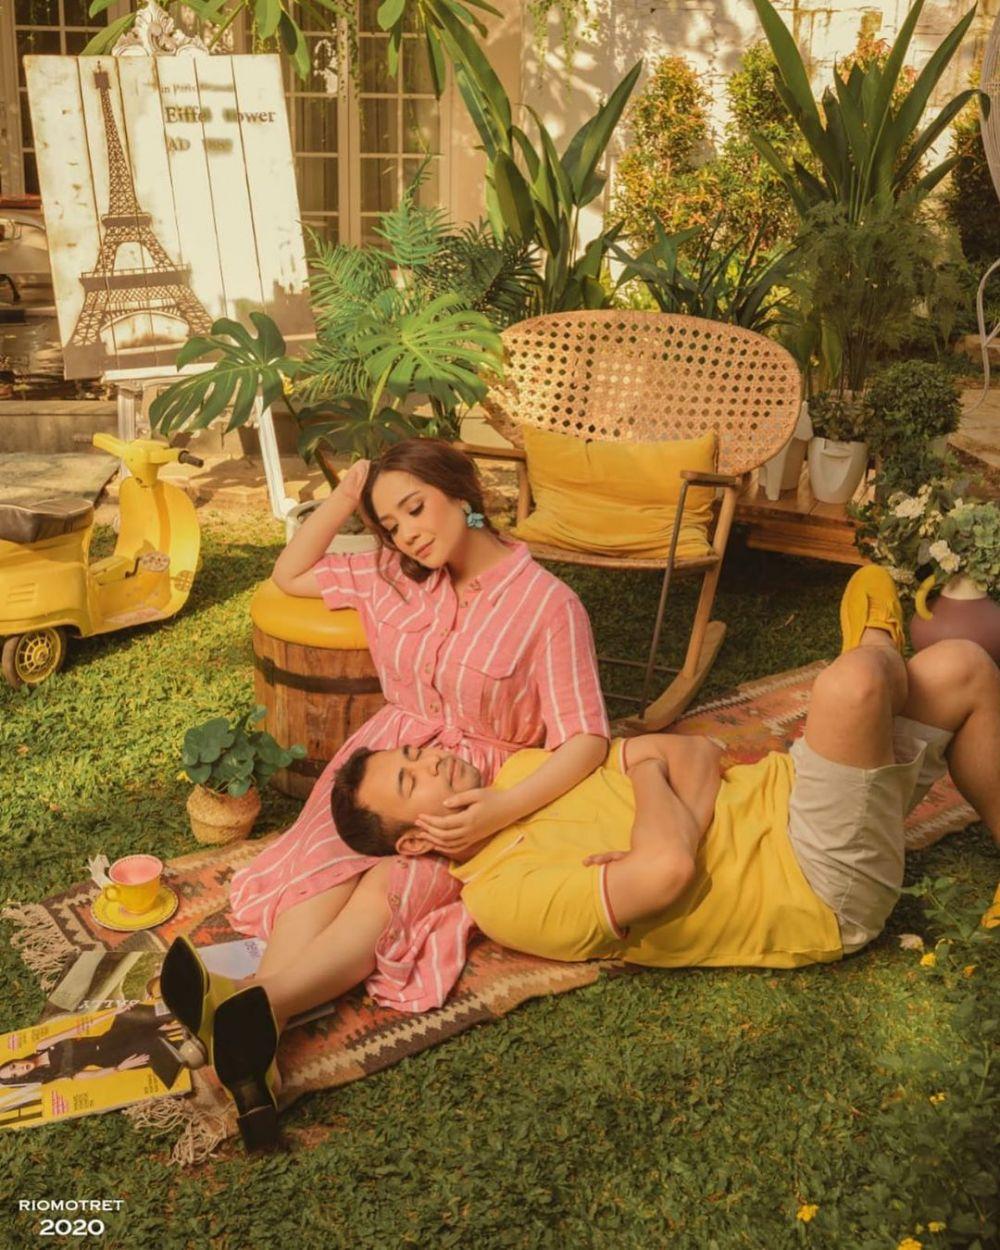 Pasangan duet penyanyi bikin baper  berbagai sumber